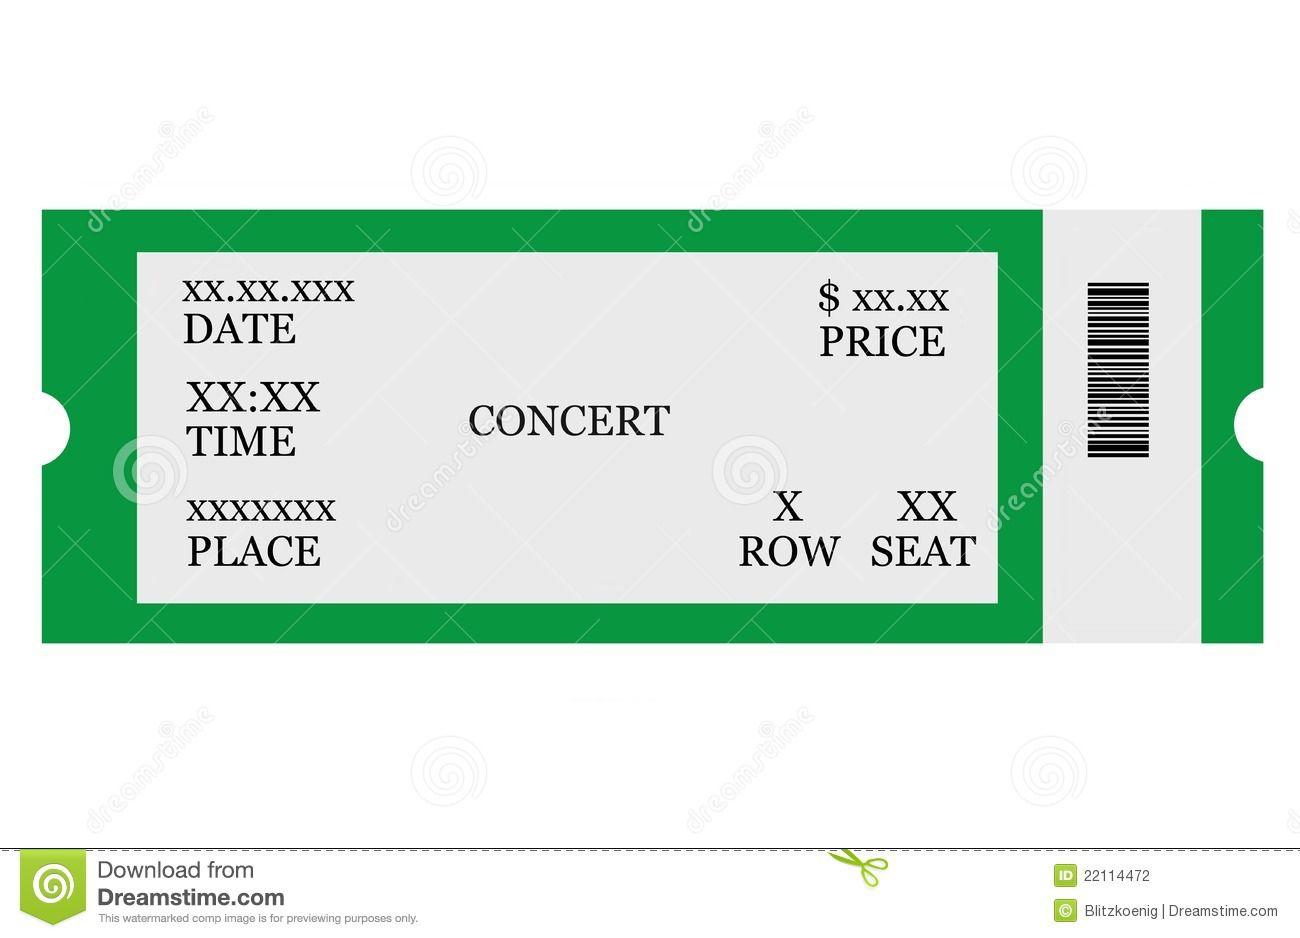 008 Sensational Free Printable Concert Ticket Clipart Photo Full